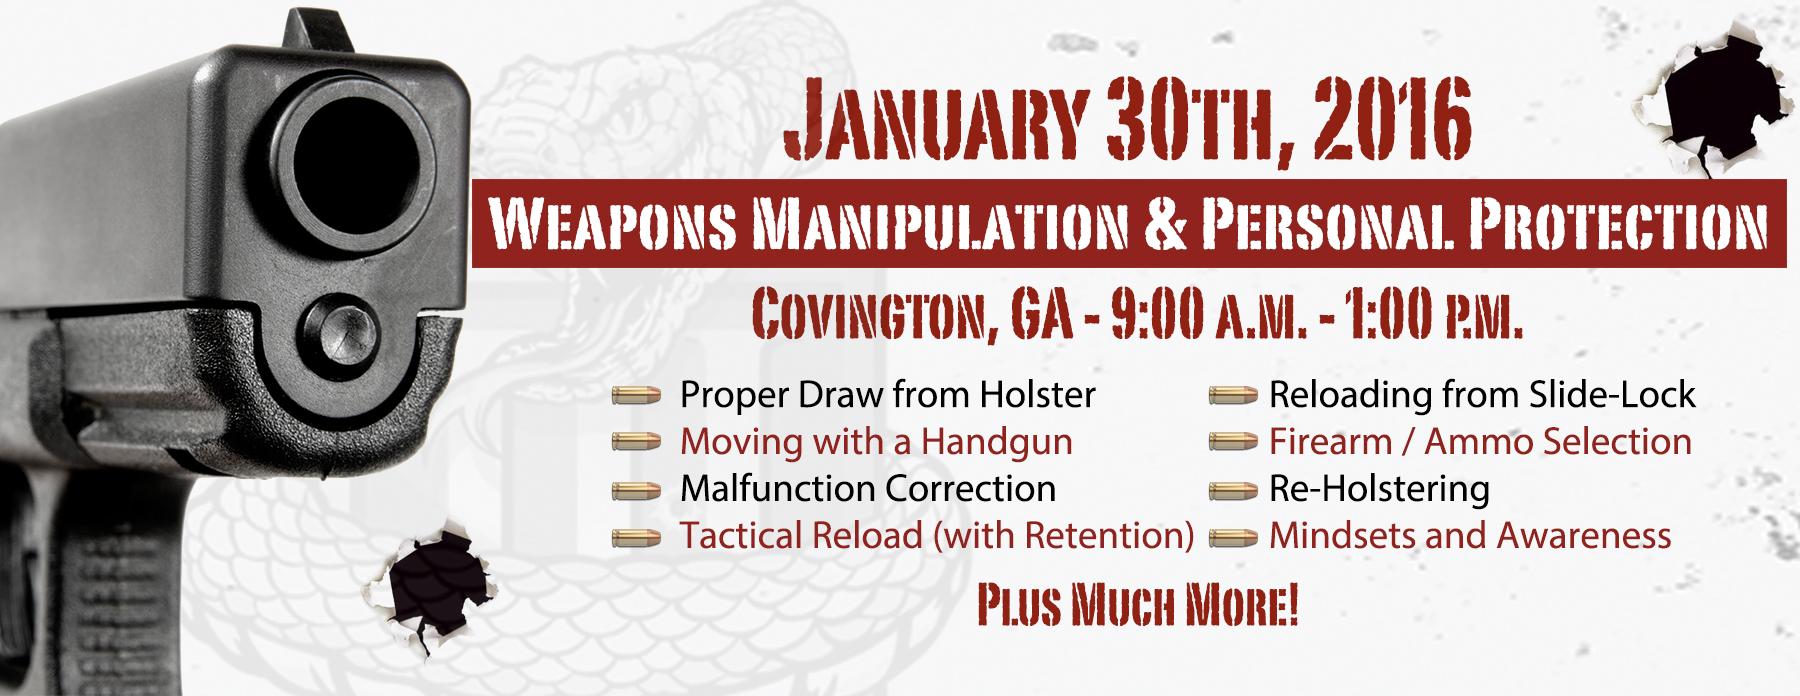 Weapons Manipulation Handgun Training - Atlanta Georgia